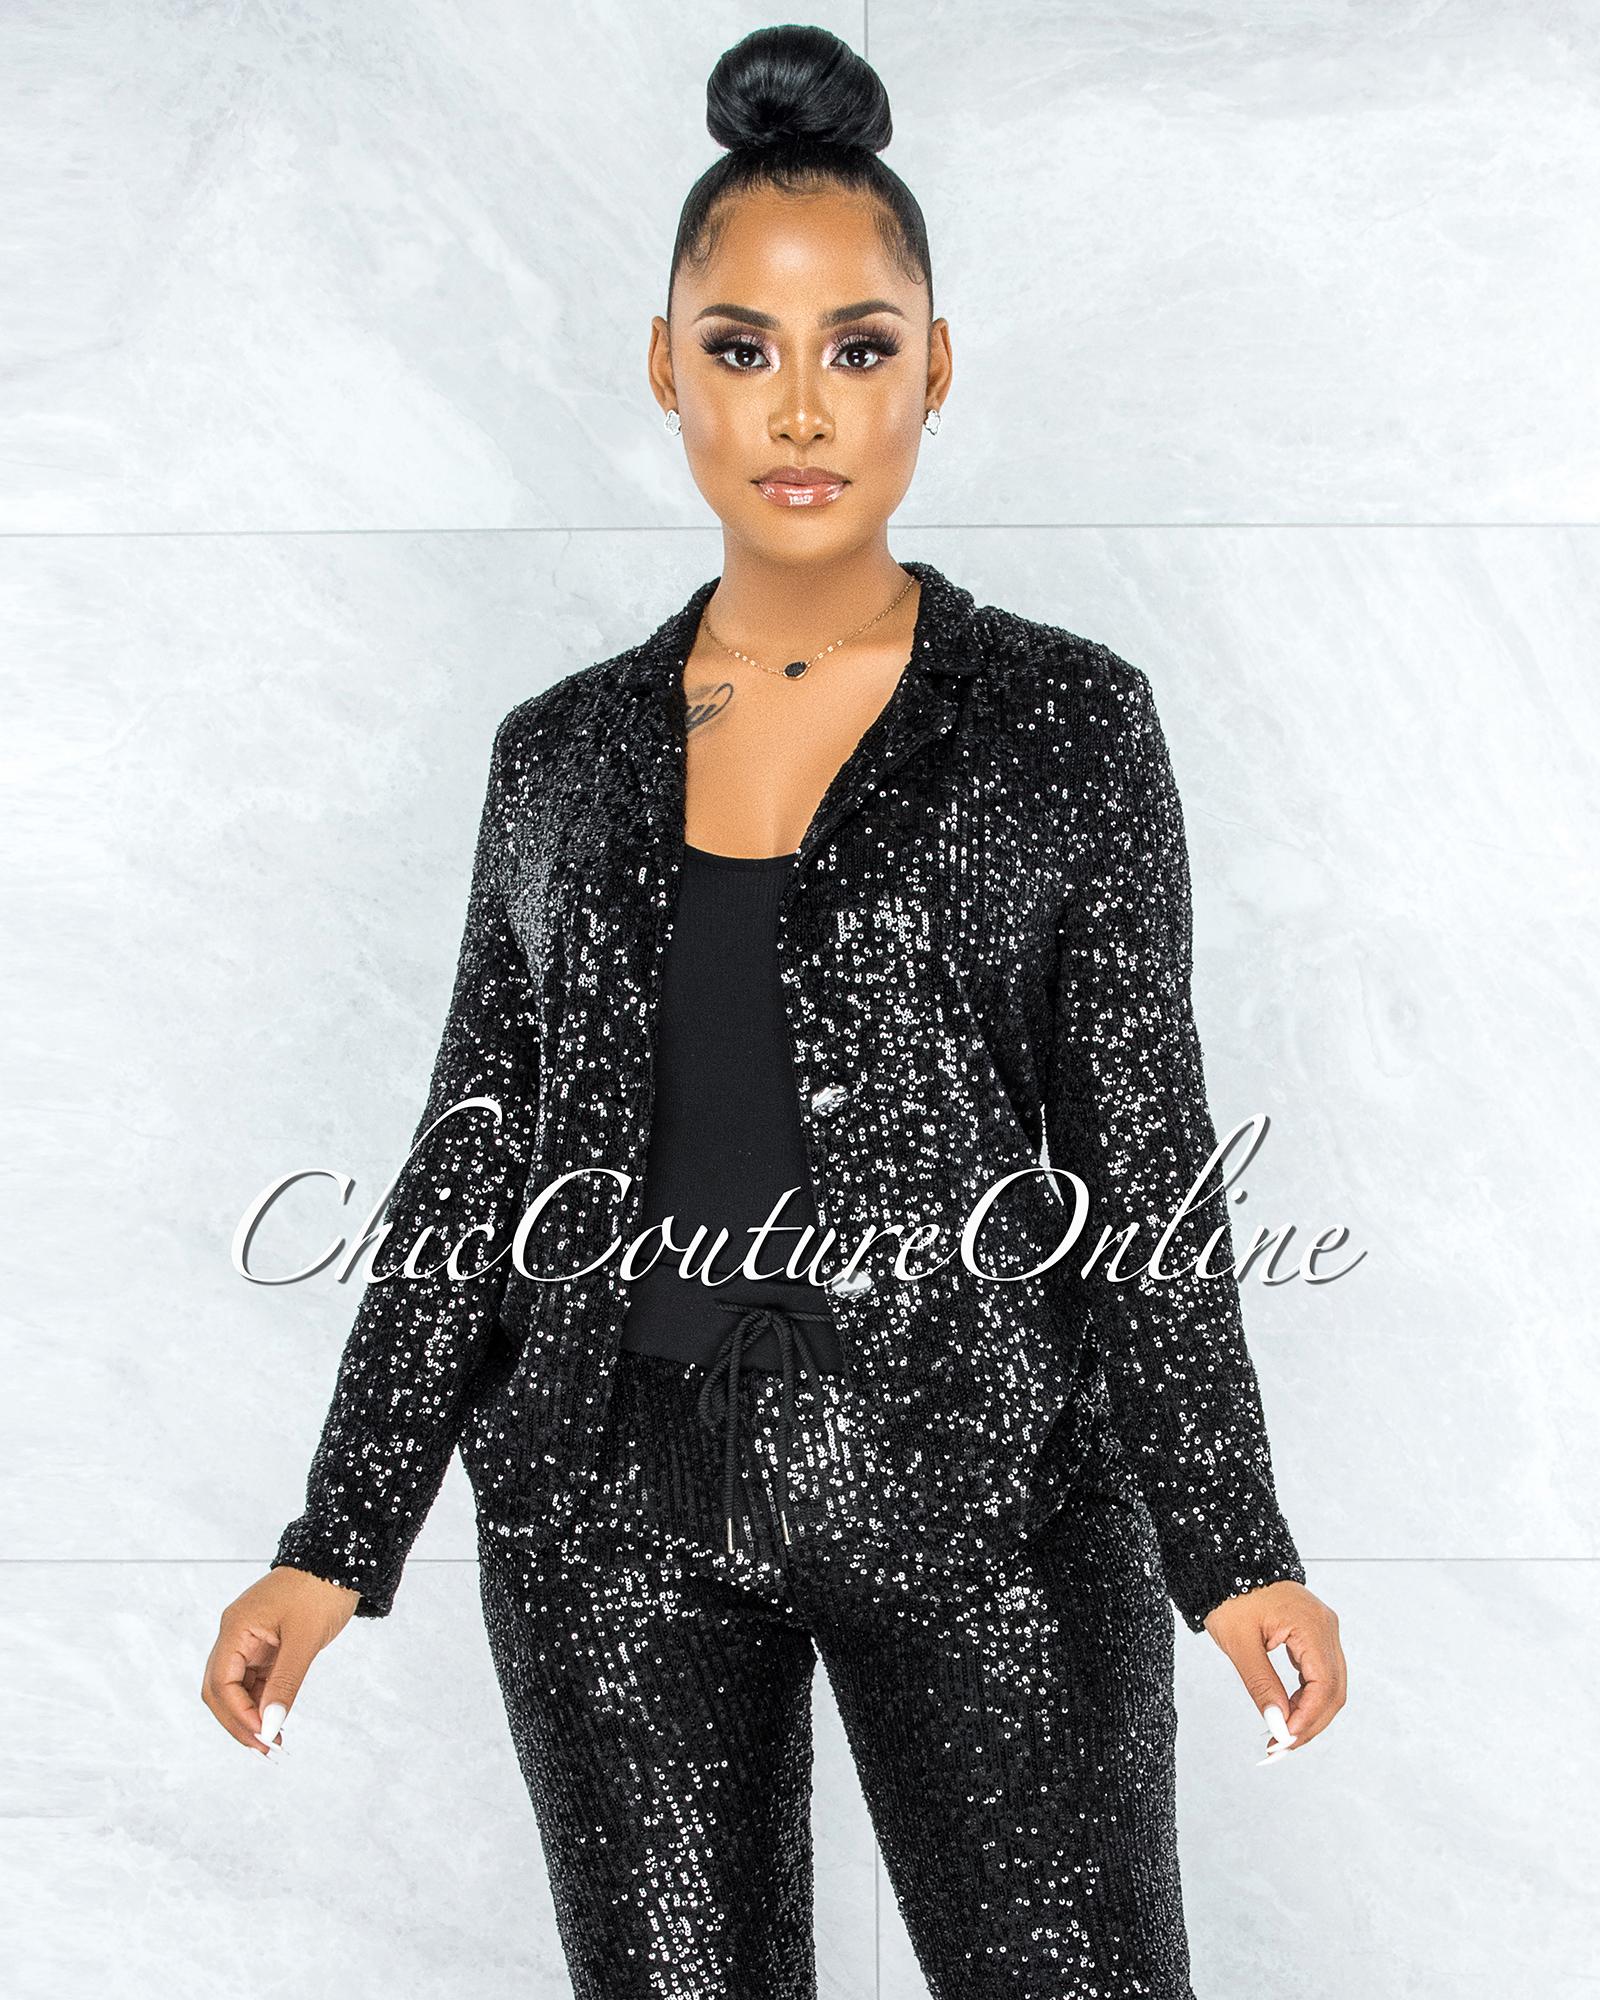 Daryen Black Sequins Double Breast Jacket